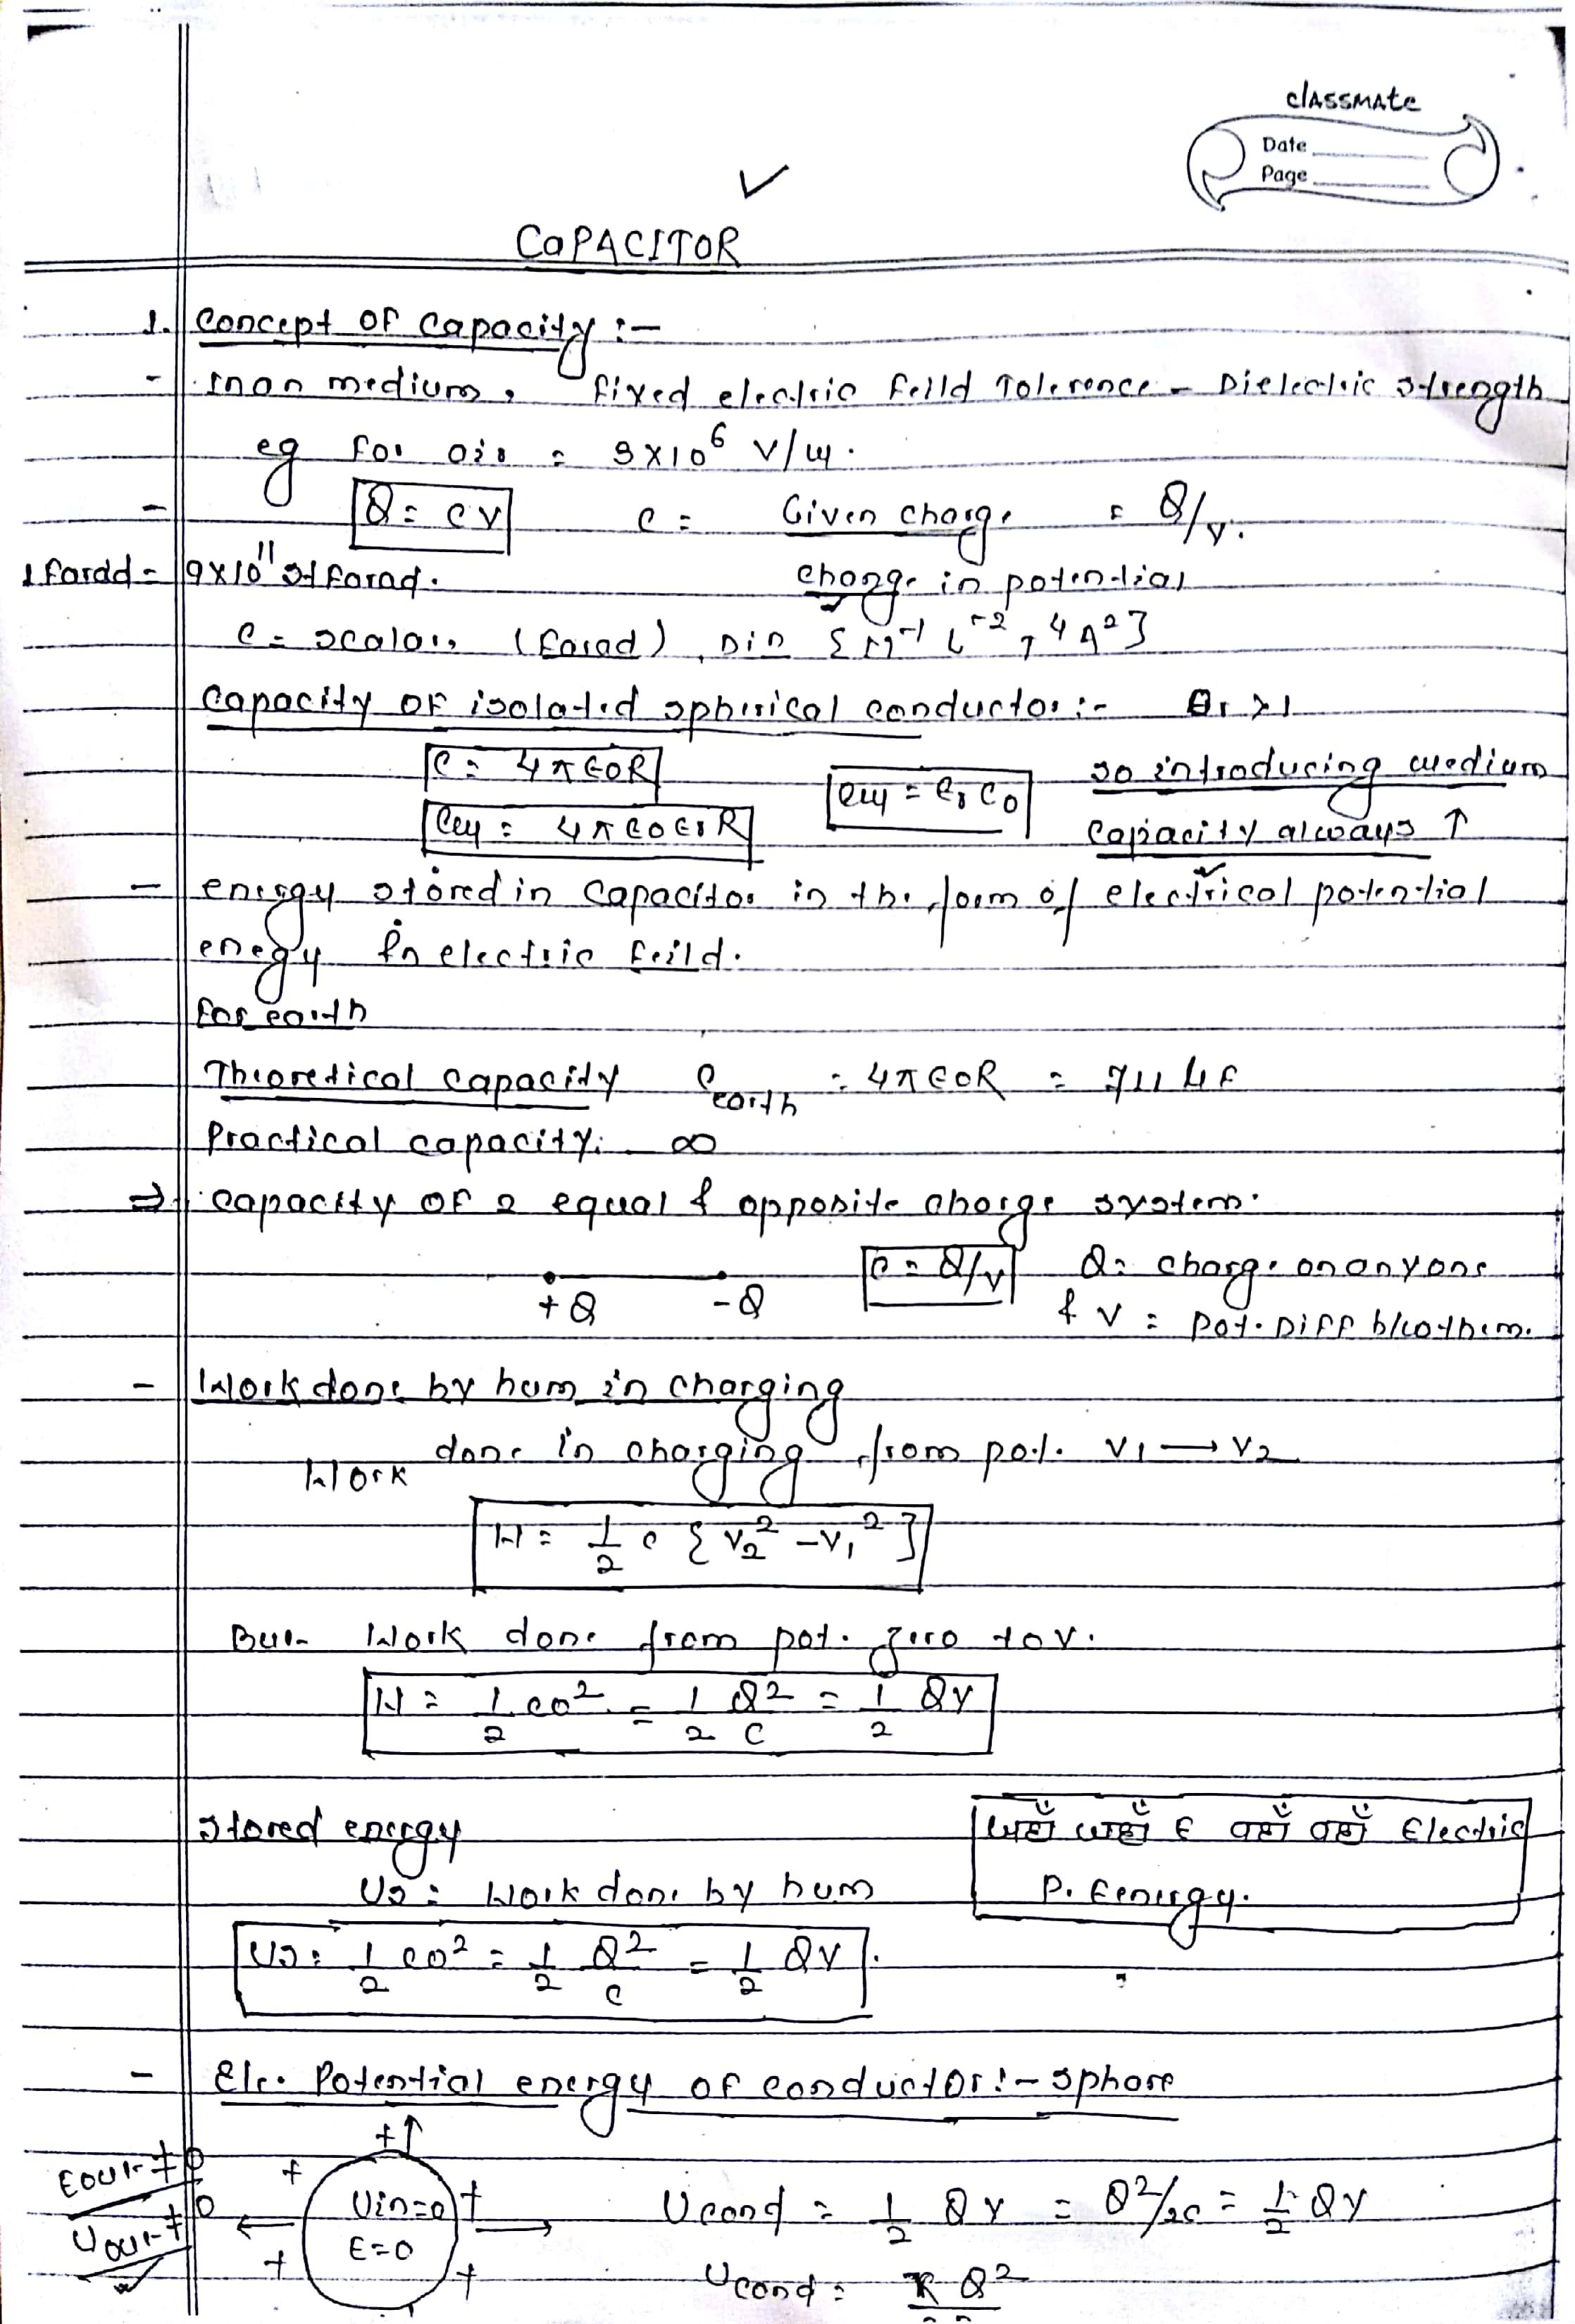 CAPACITOR HANDWRITTEN NOTES 1